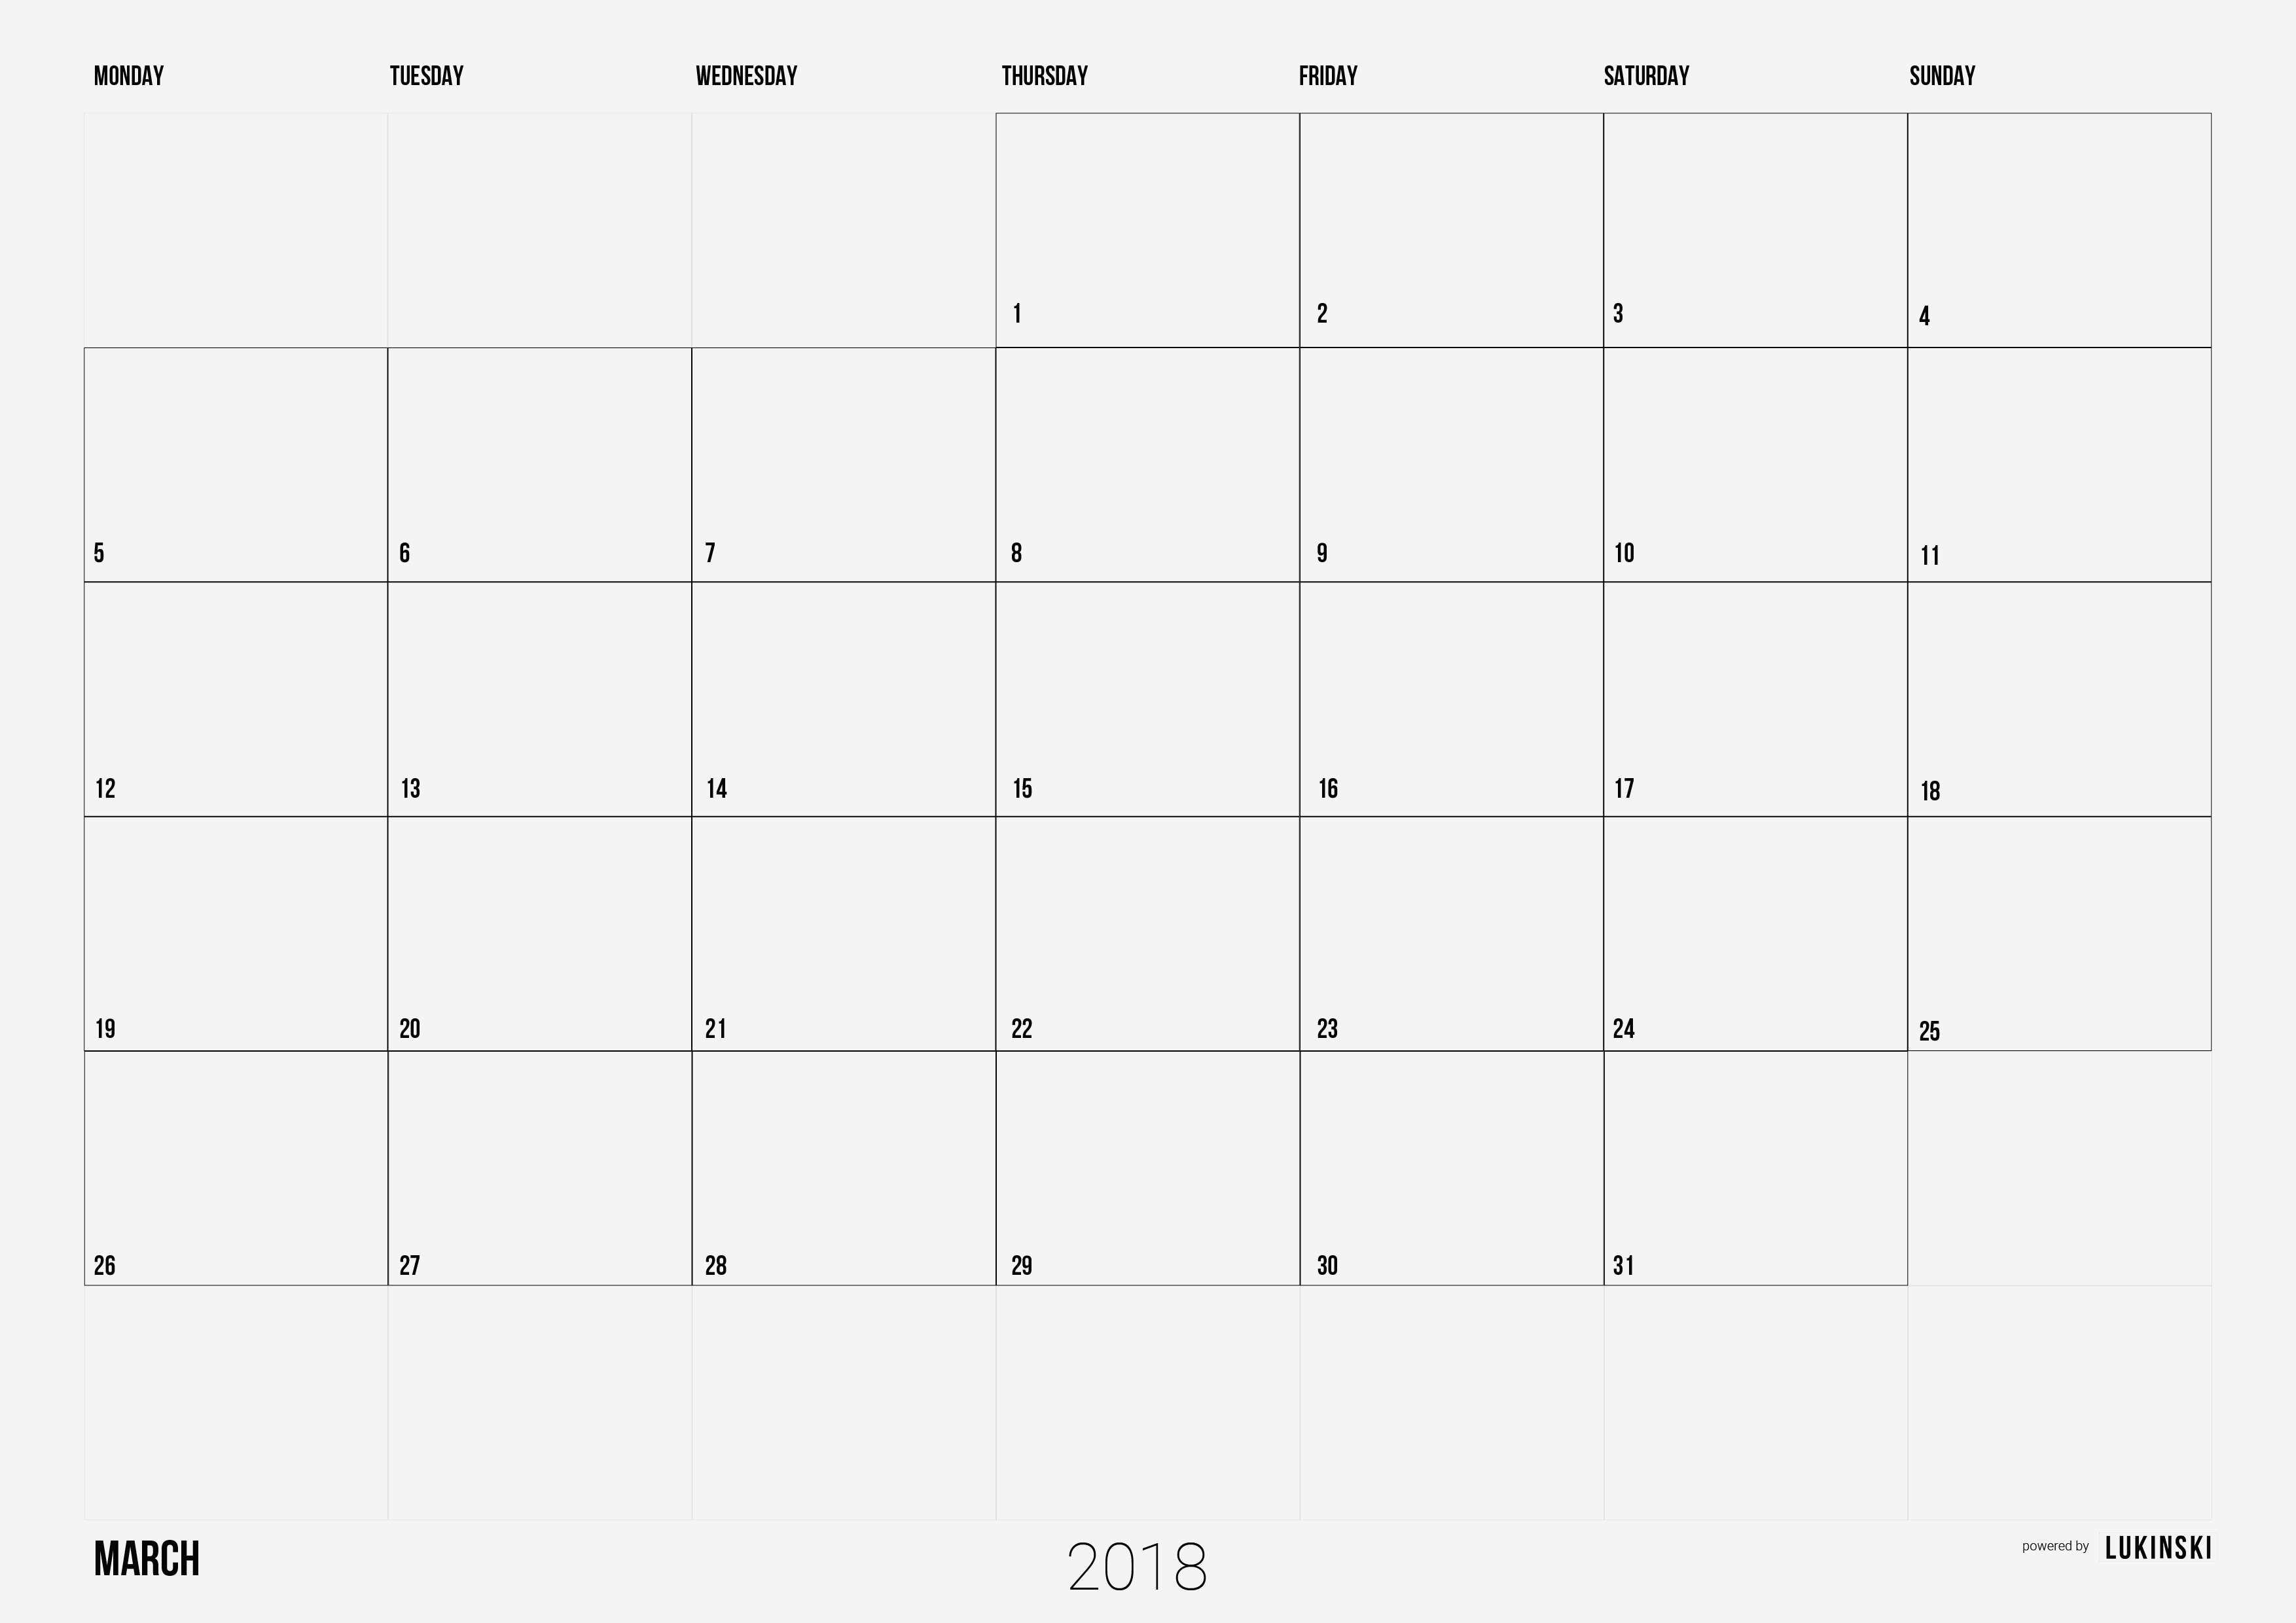 Calendar 2019 Free Download Recientes Awesome 2018 Monthly Calendar Template Of Calendar 2019 Free Download Más Arriba-a-fecha Beautiful 25 Examples Print A Calendar 2019